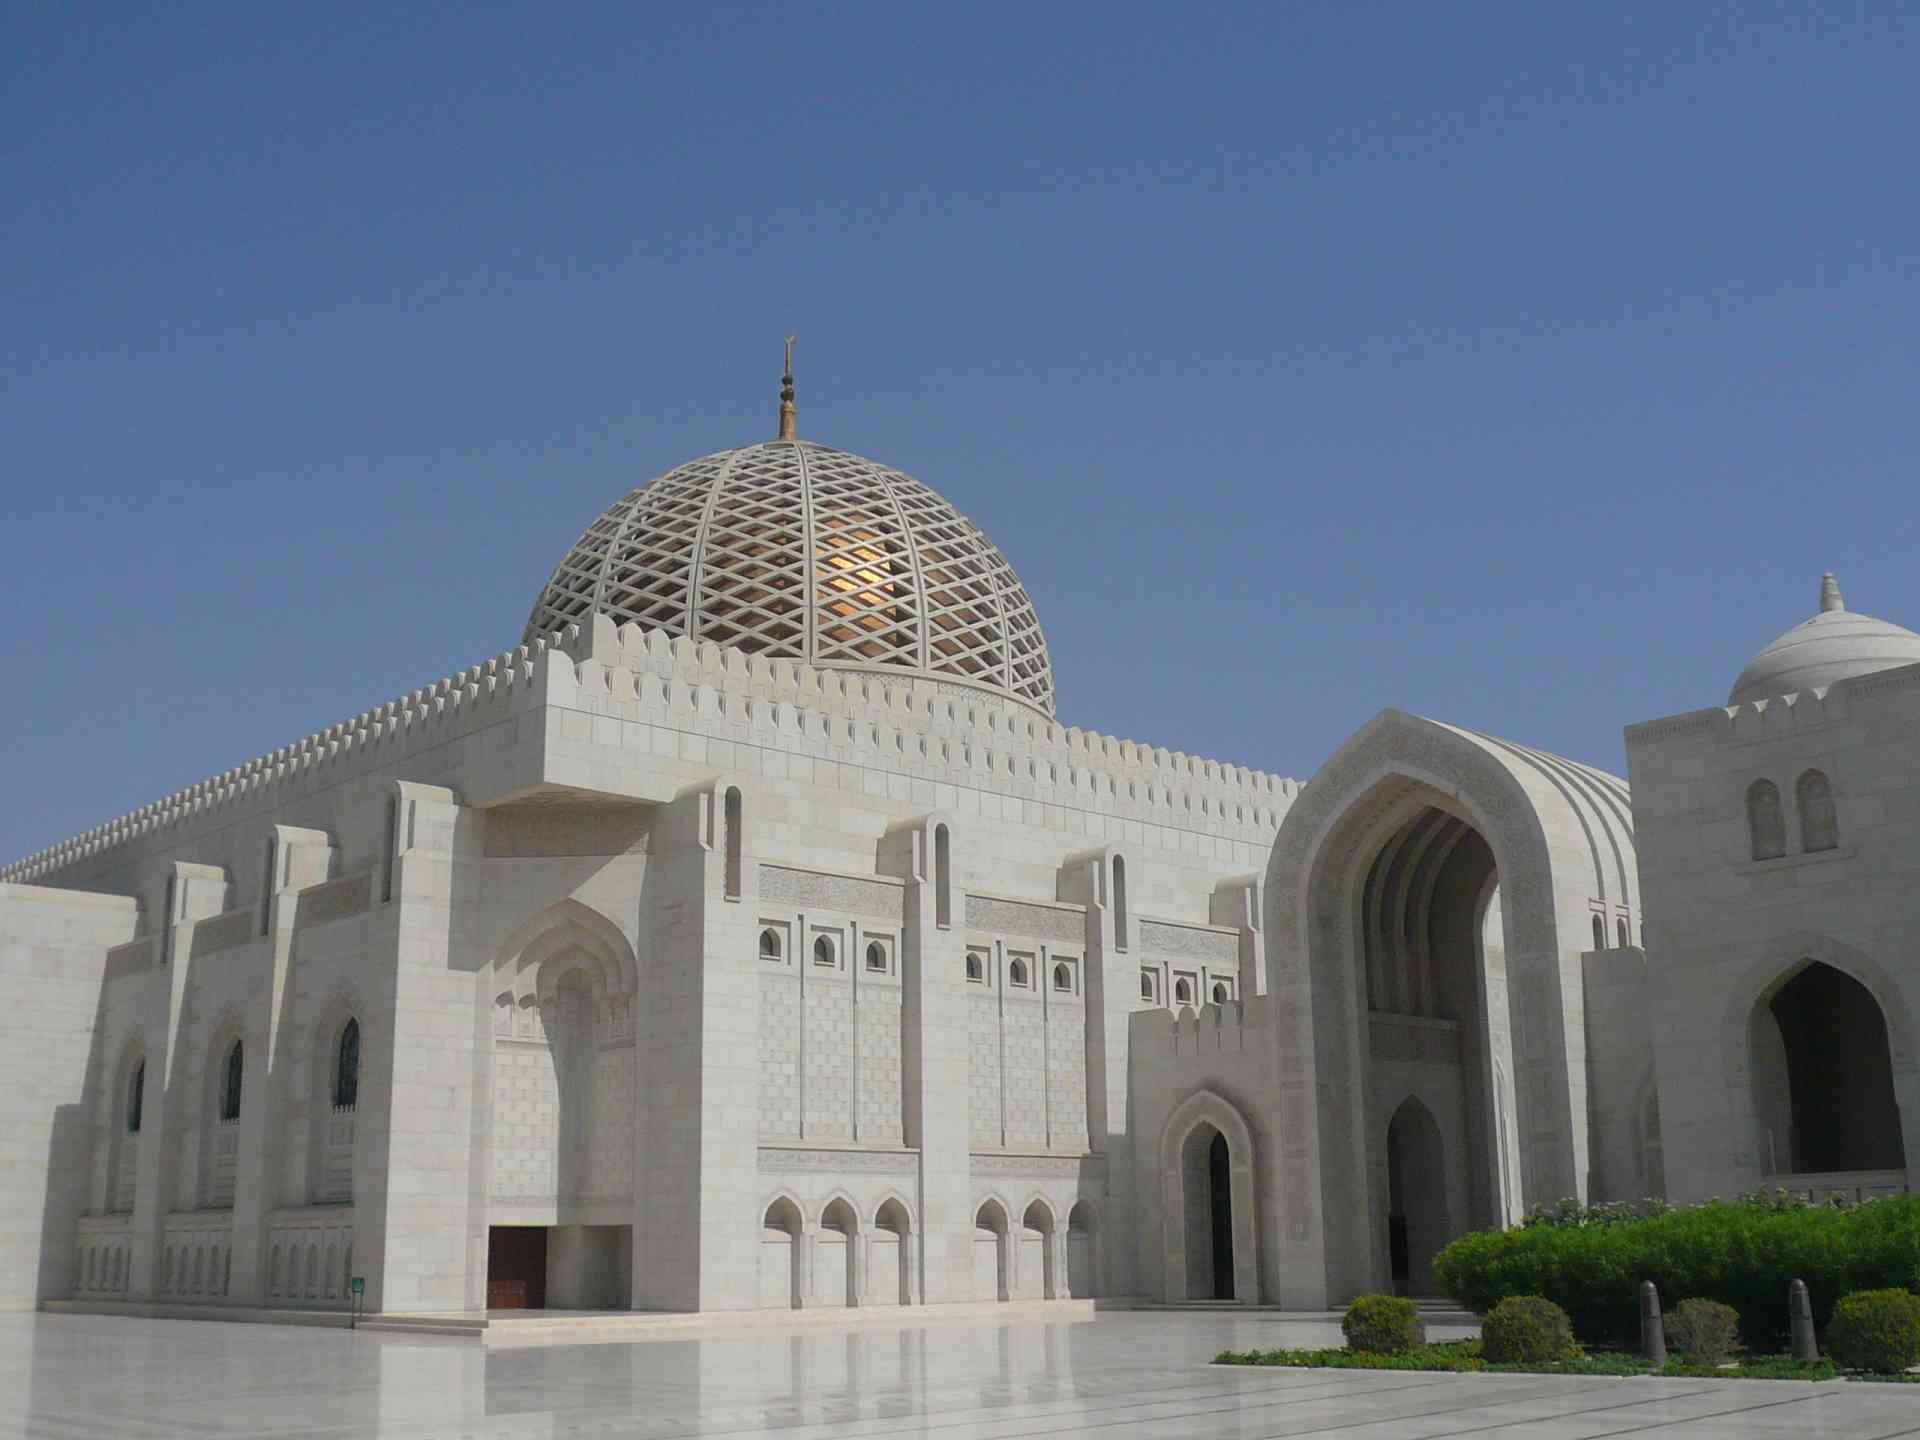 Muscat Grand Mosque, by Sacha Bunnik